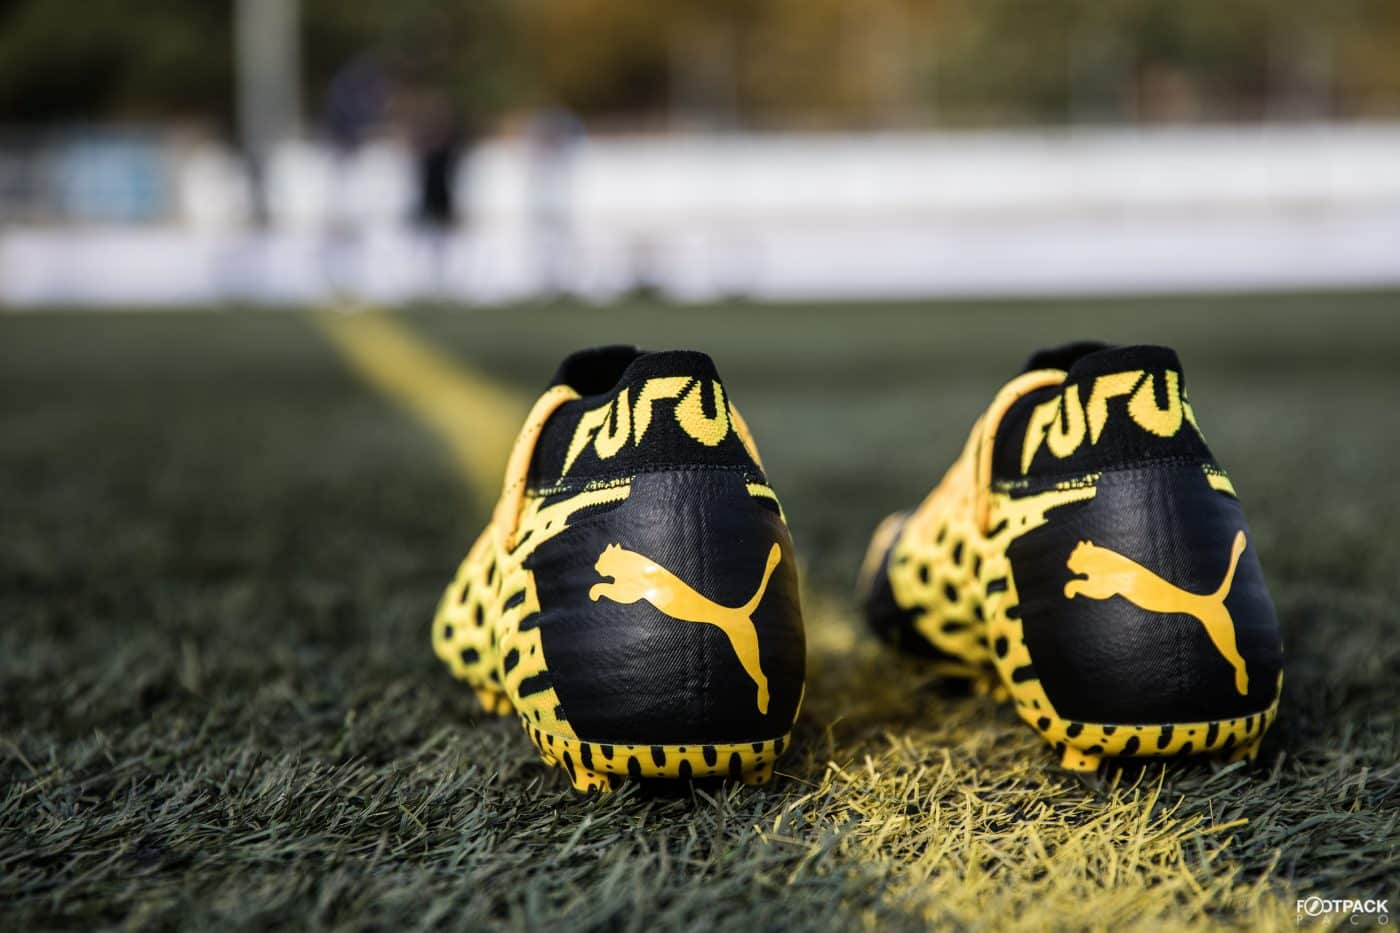 chaussures-de-foot-puma-future-5.1-spark-janvier-2020-footpack-5